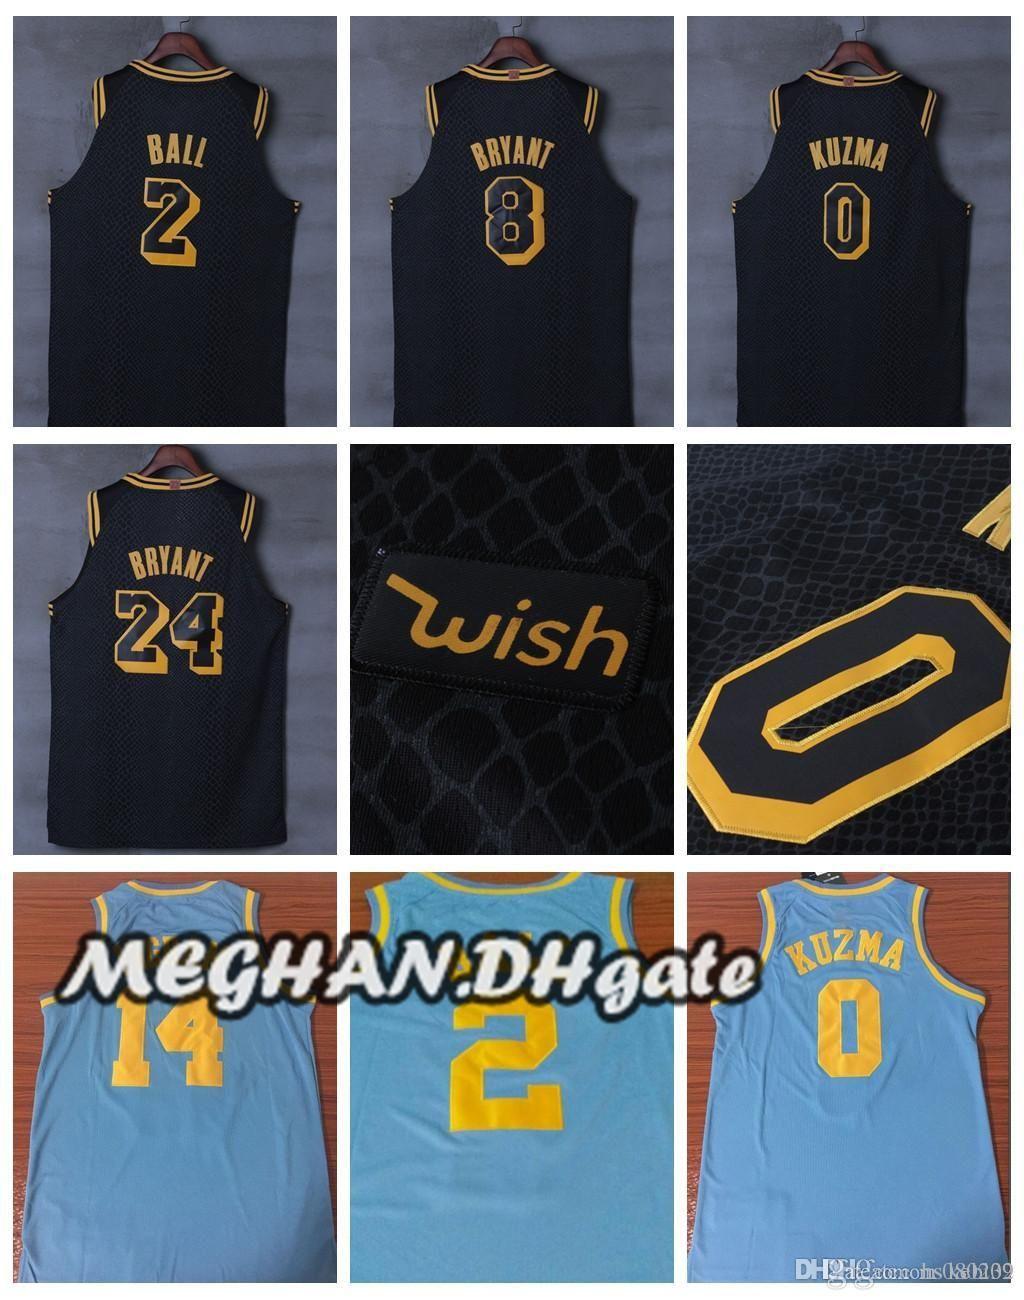 3f8349f6d52e 2018 New Los Angeles Lakers New City Basketball 2018 Hot Sale Jerseys 0  Kyle Kuzma Jersey 24 8 Kobe Bryant 2 Lonzo Ball Jerseys From Hs080237